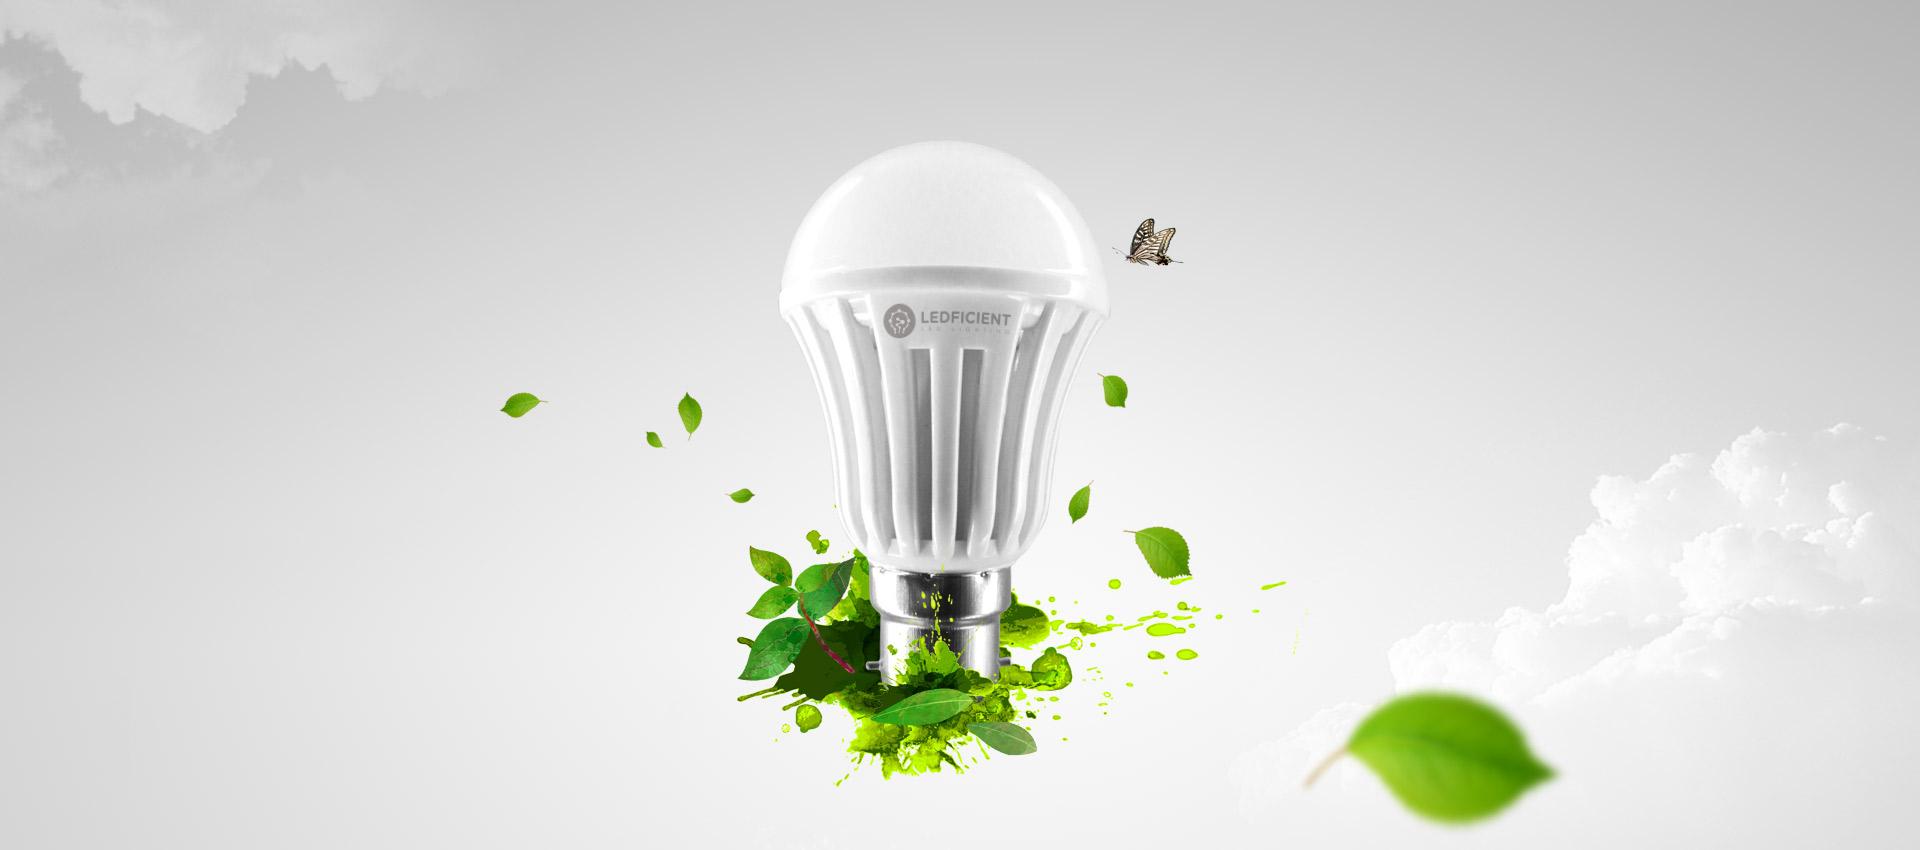 led lighting branding by Z Creative Studio Branding & Graphic Design Melbourne